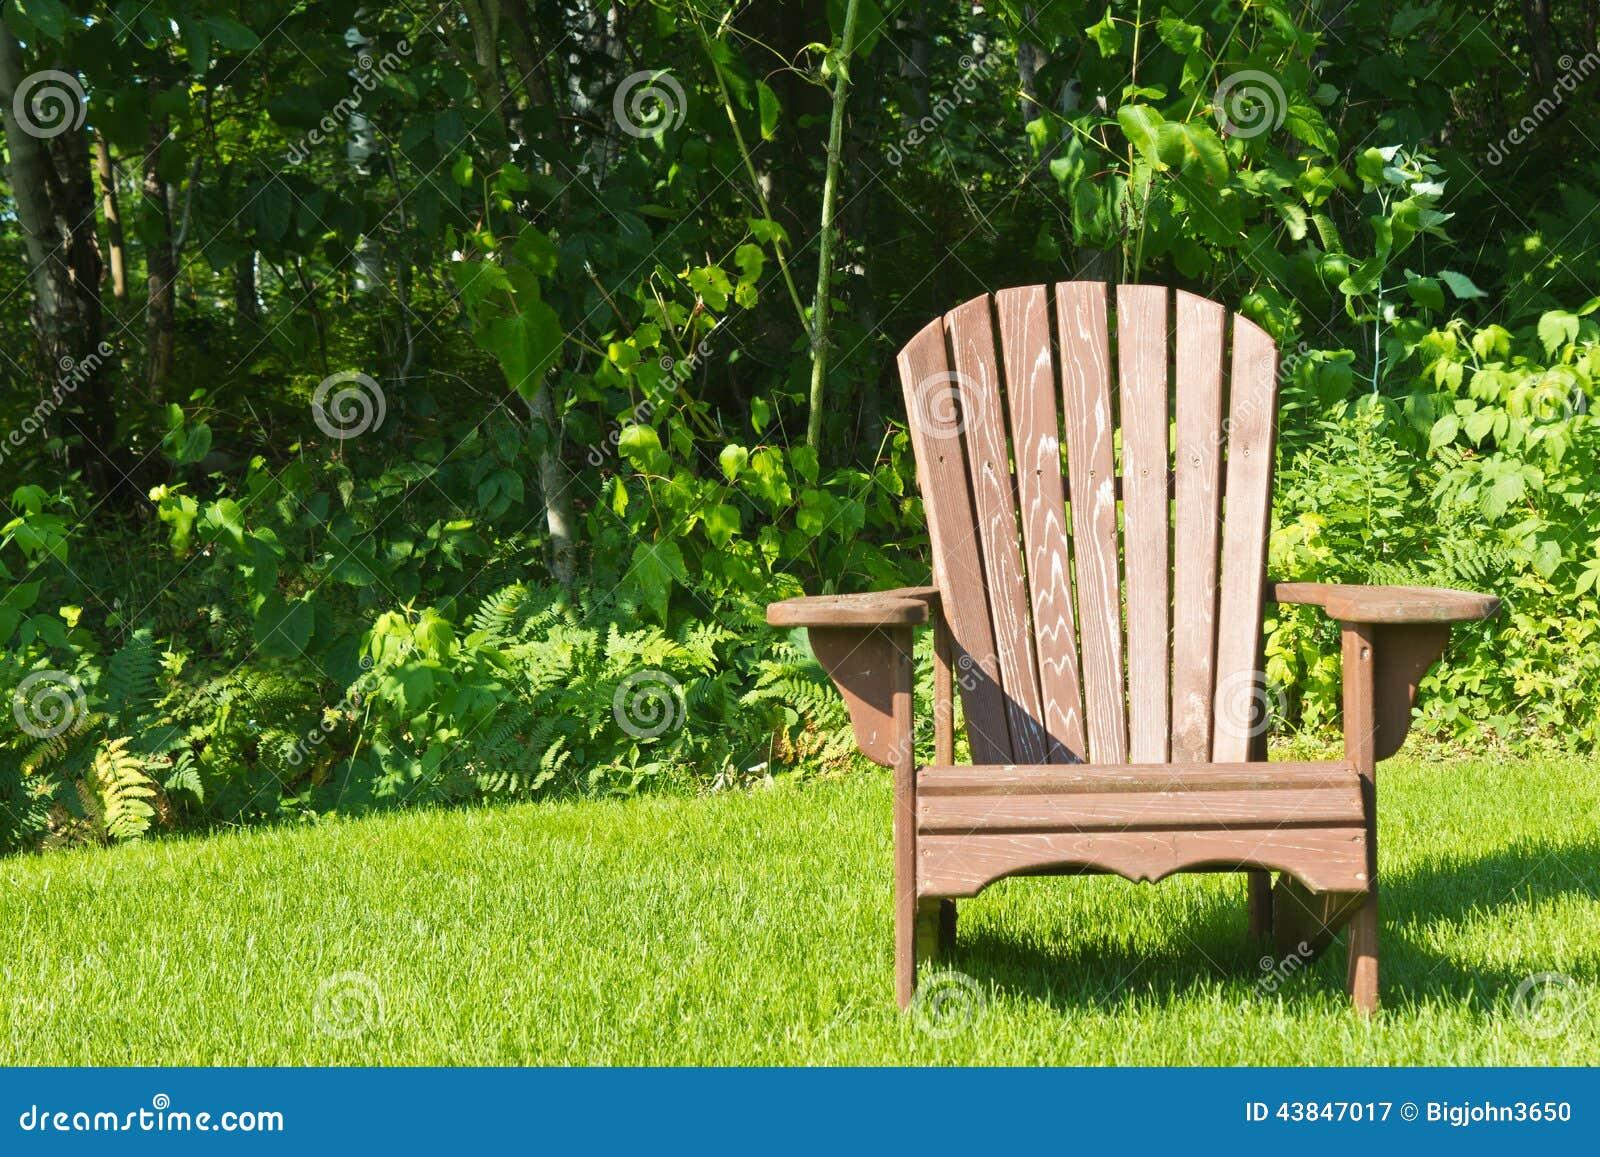 Adirondack Chair Grass Green Lawn Outside ...